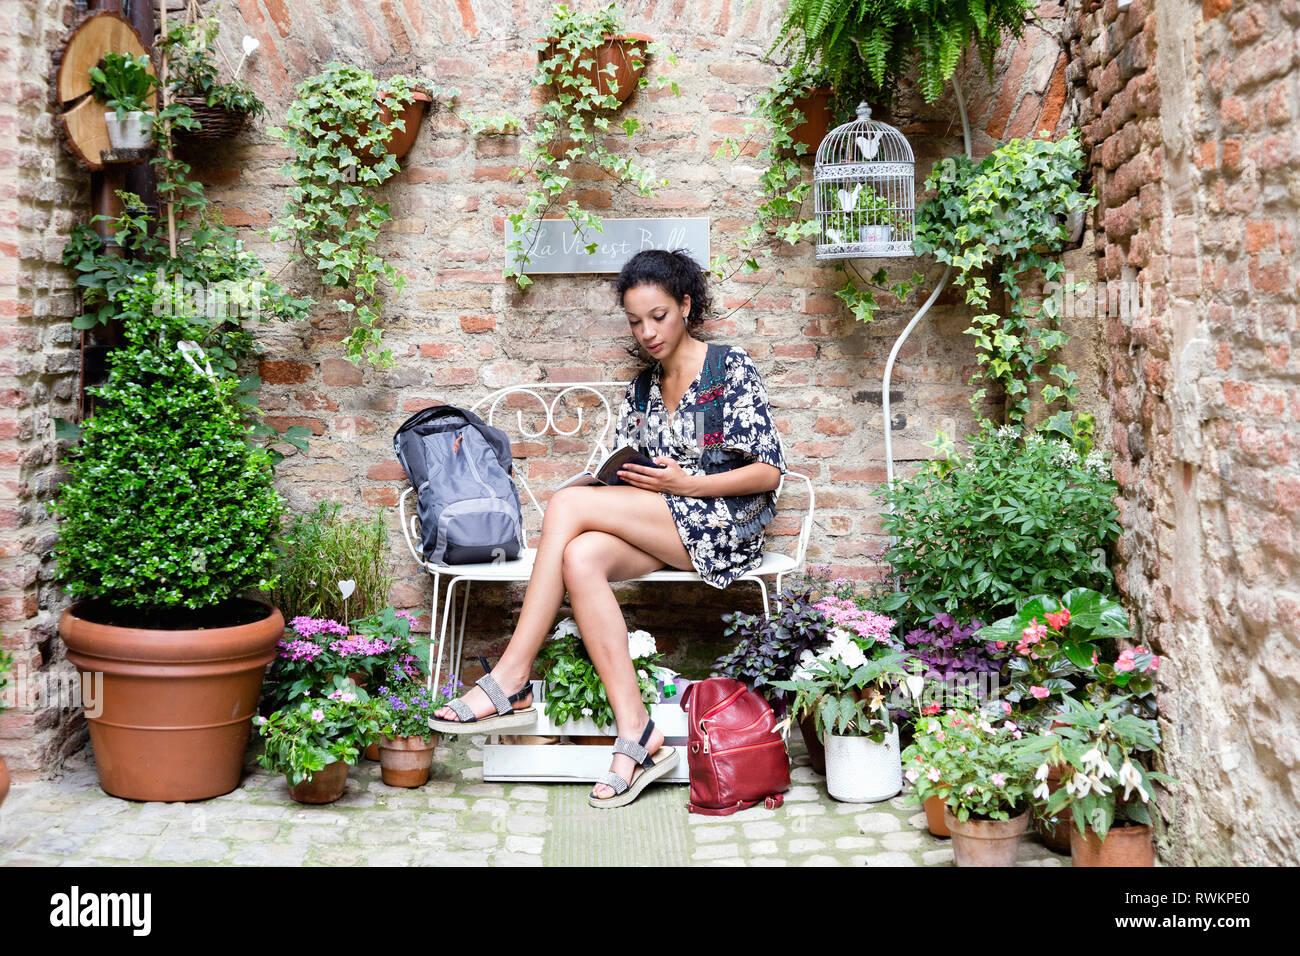 Woman enjoying peaceful corner with plants, Città della Pieve, Umbria, Italy - Stock Image